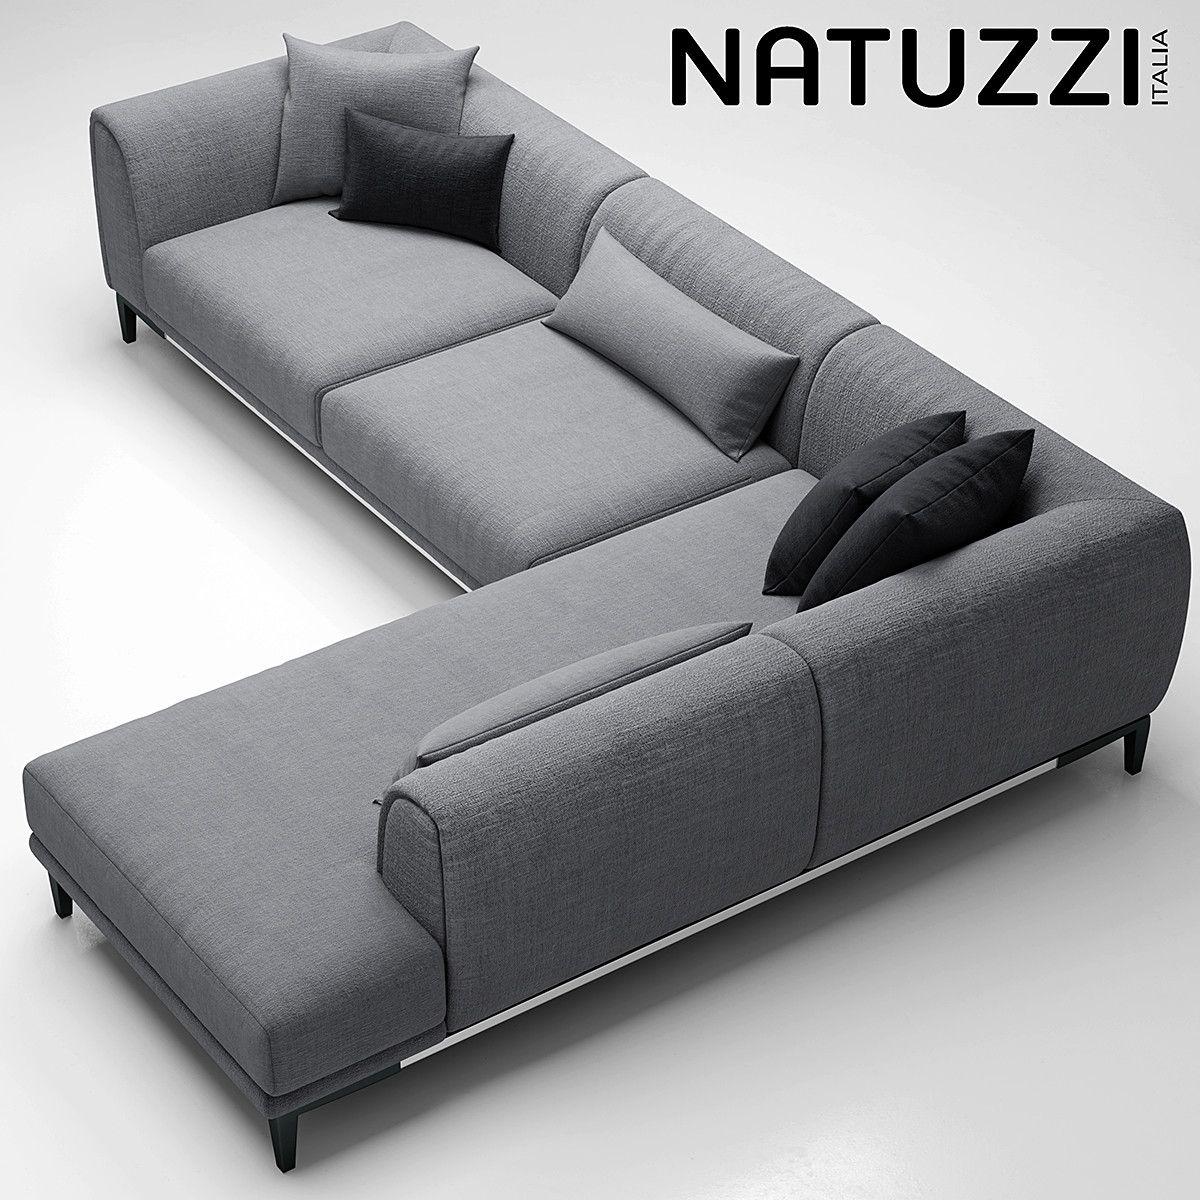 Sofa natuzzi trevi d model our home pinterest sofas d and